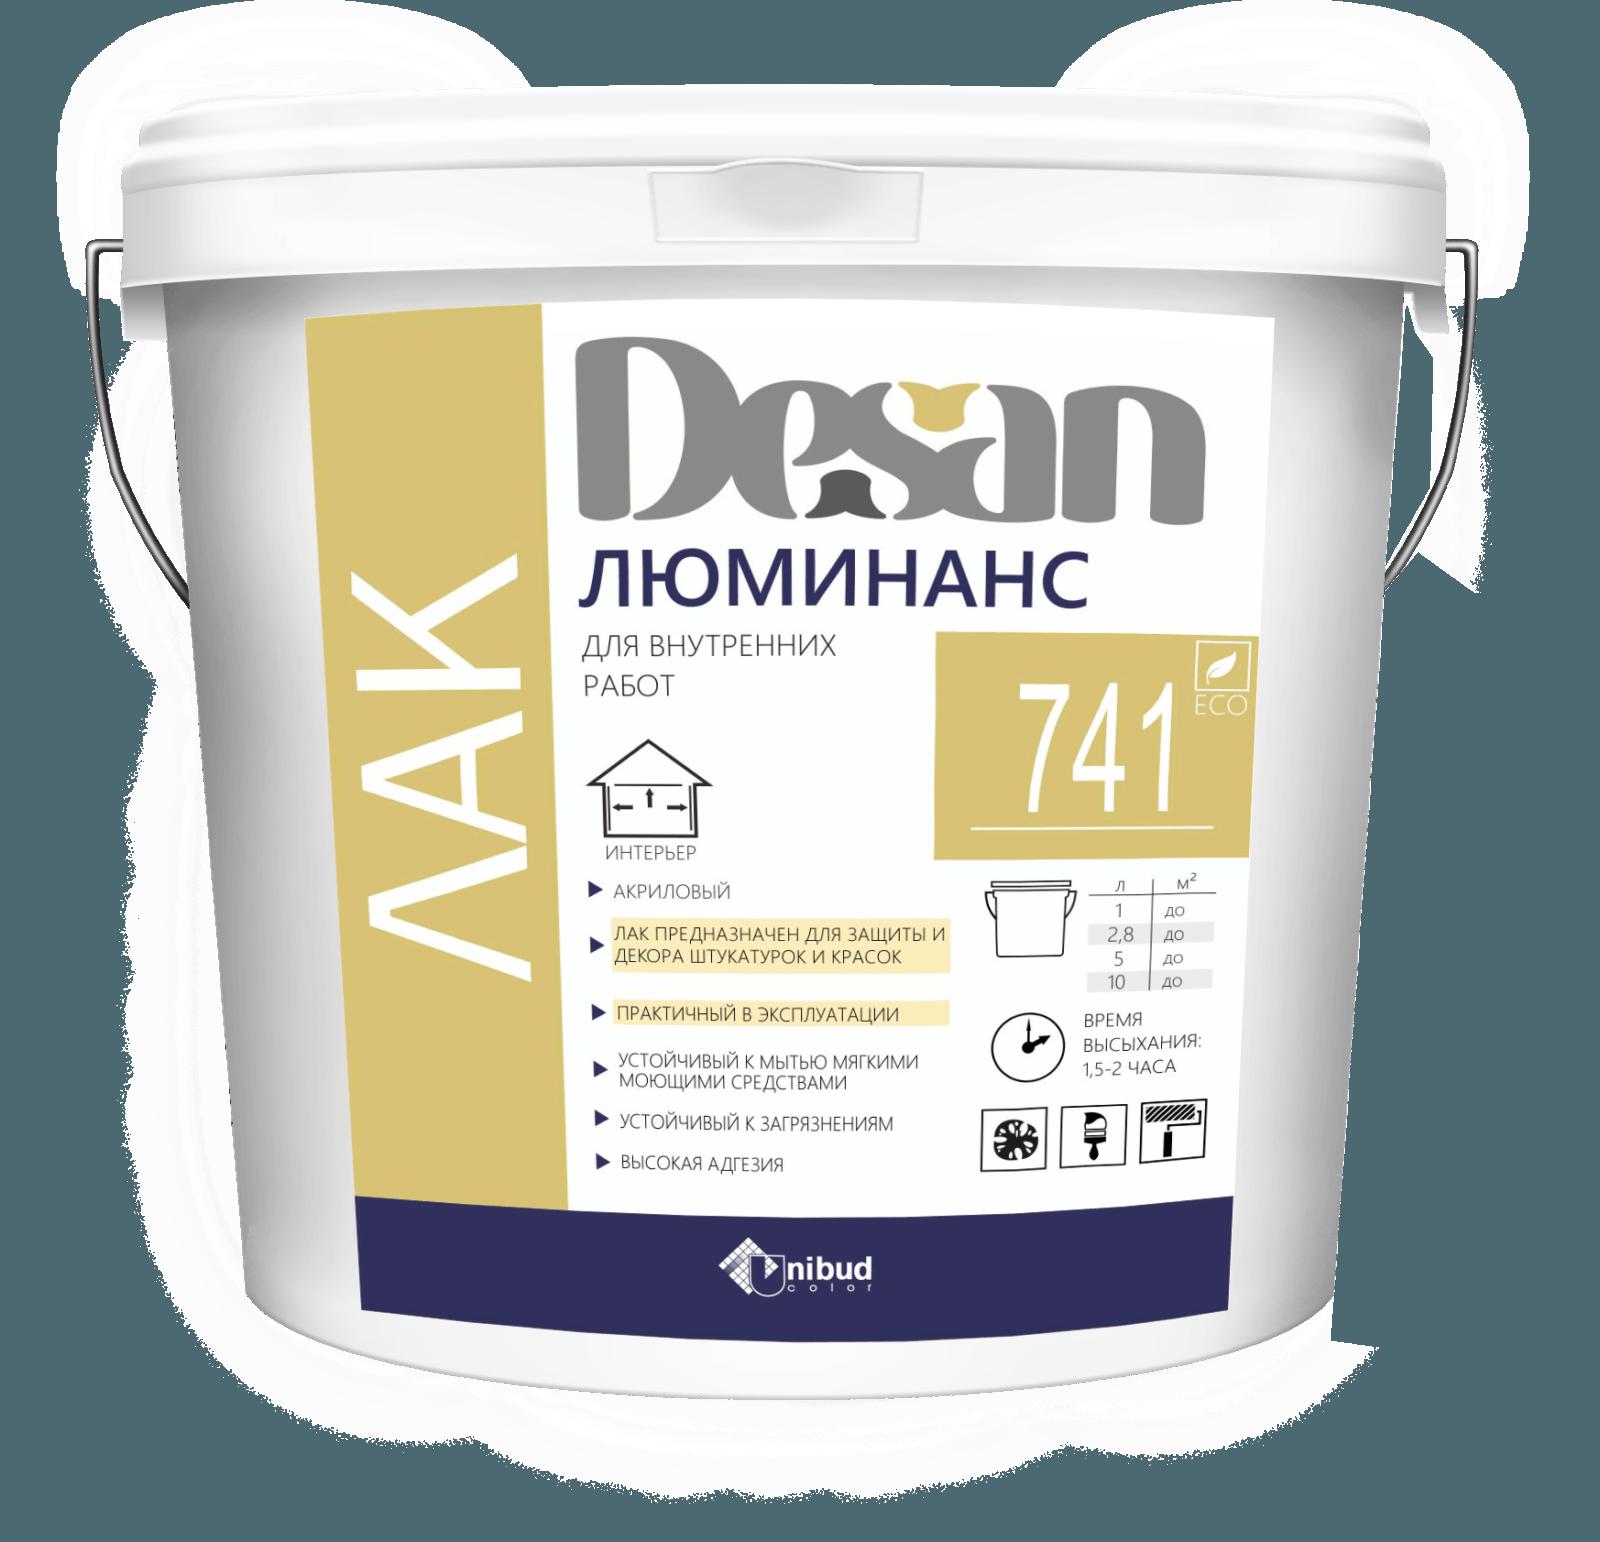 Desan Люминанс ВД-АК-201